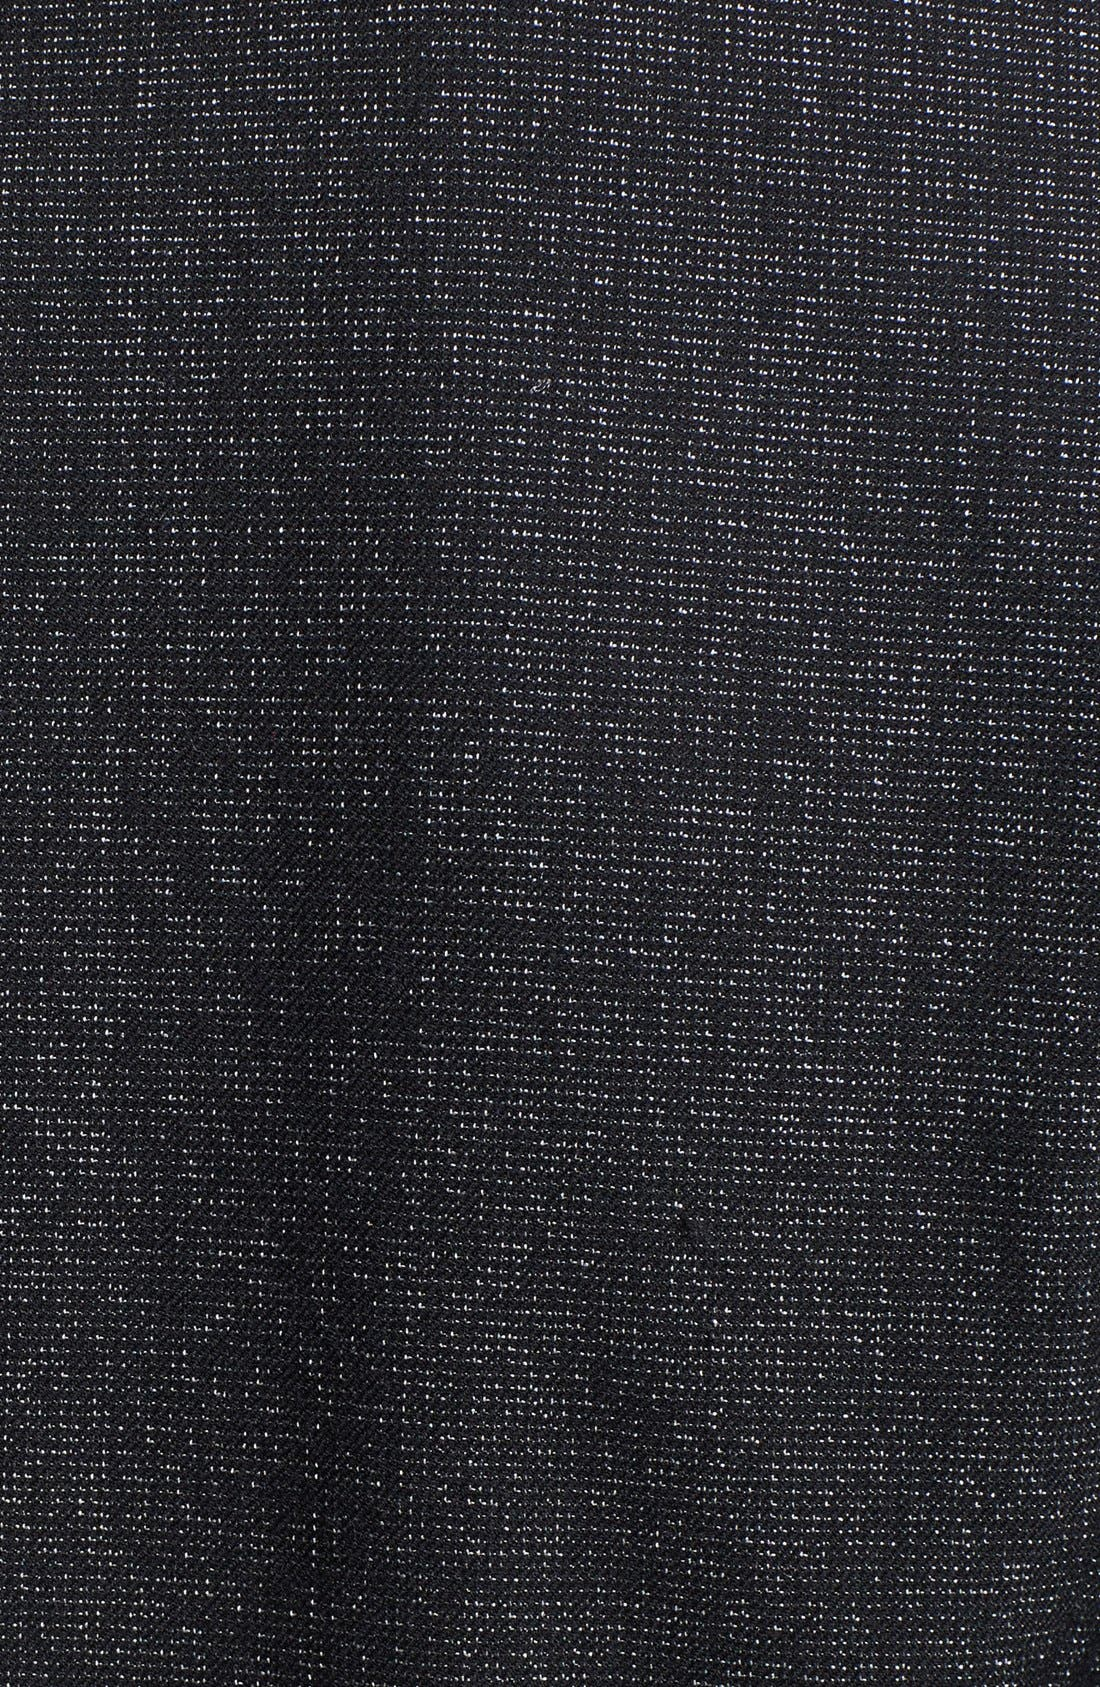 VINCE CAMUTO, Faux Leather Collar Peplum Blazer, Alternate thumbnail 3, color, 001